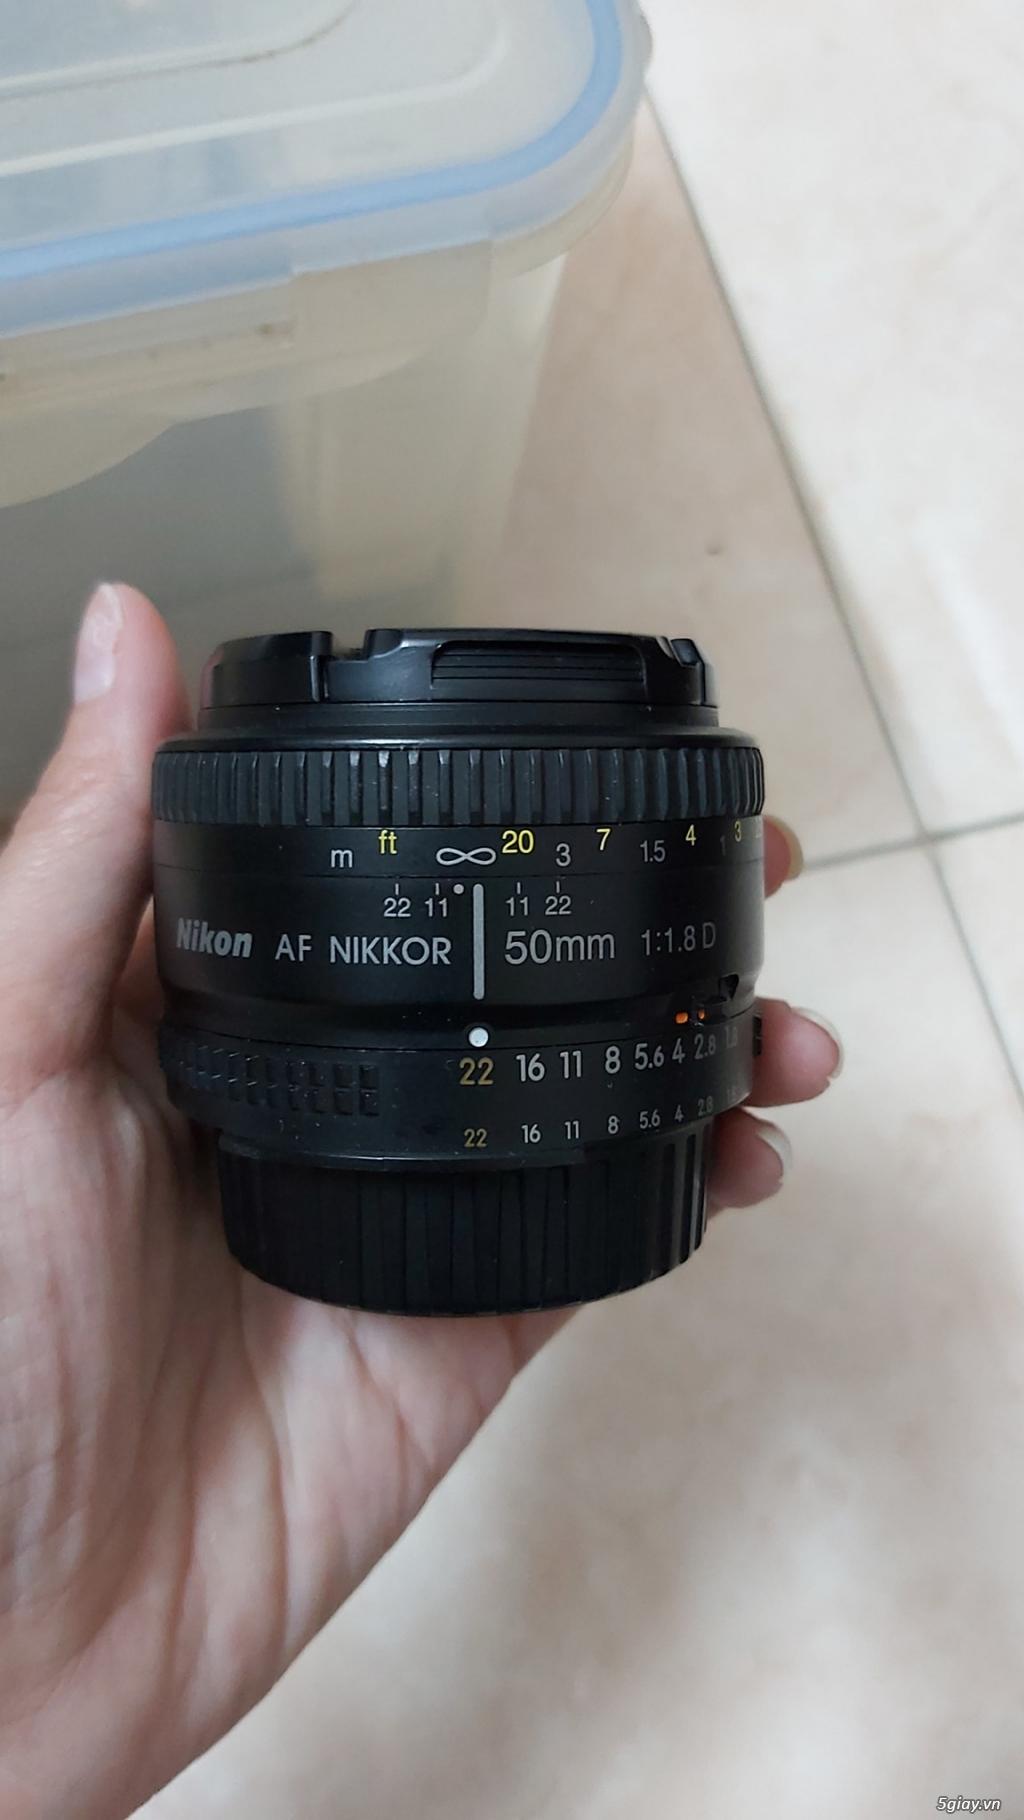 Cần bán máy NIKON D7000 + Lens - 1